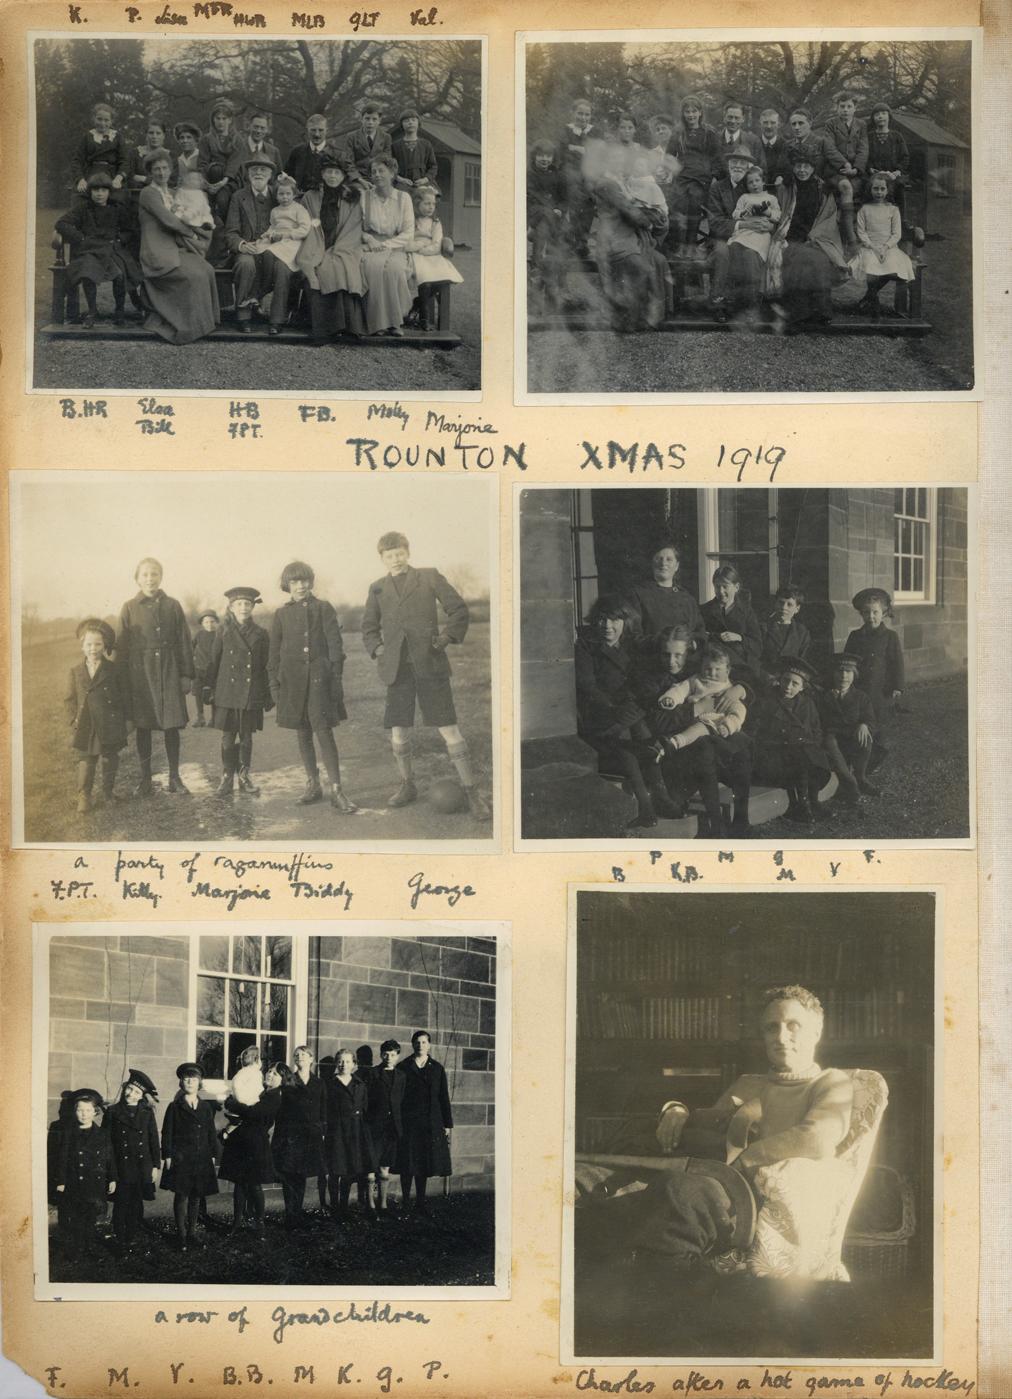 'Rounton Xmas 1919'